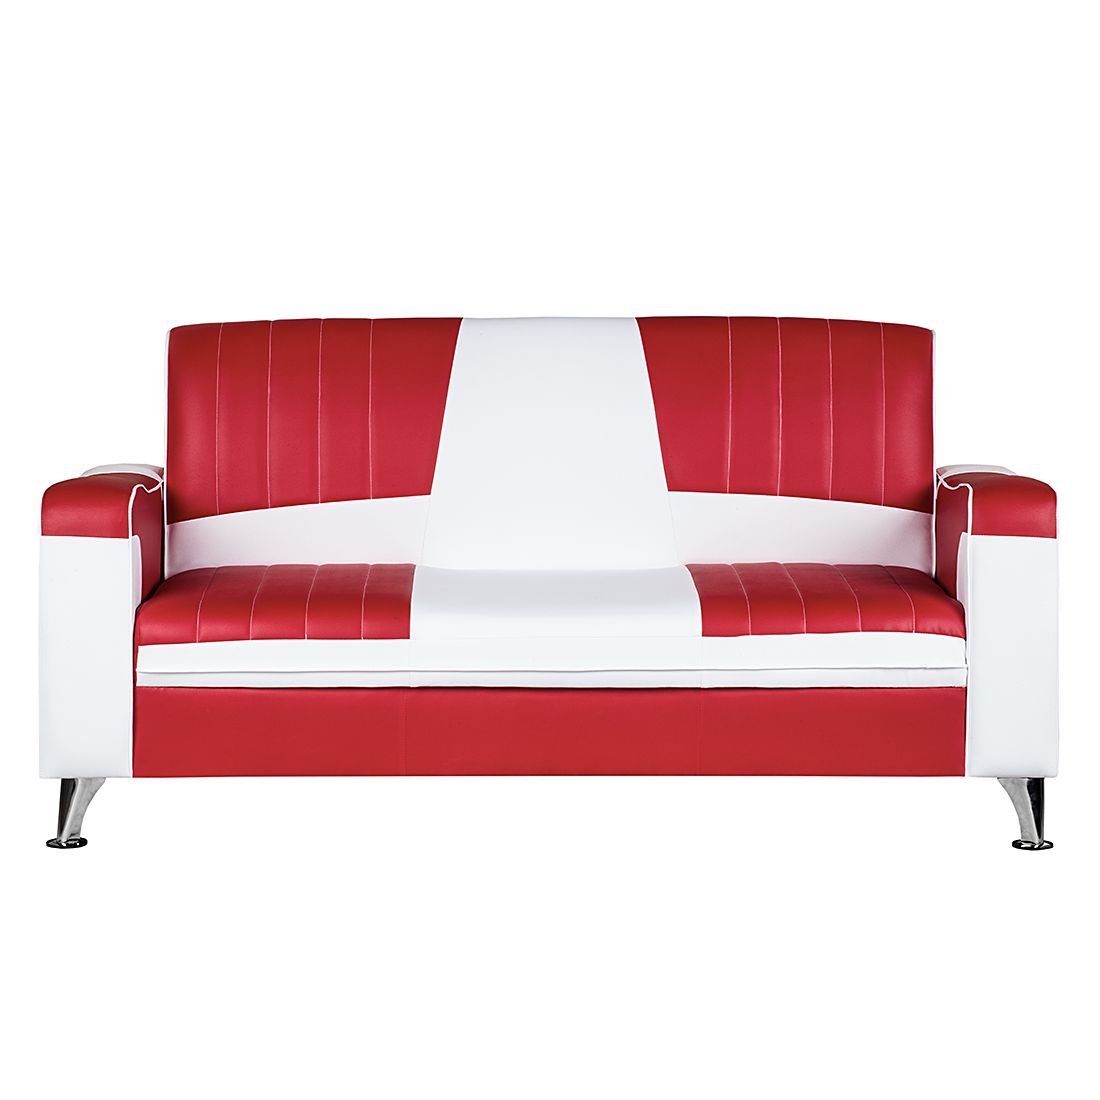 Sofa Nixa 3 Sitzer Kunstleder Rot Weiss Home24